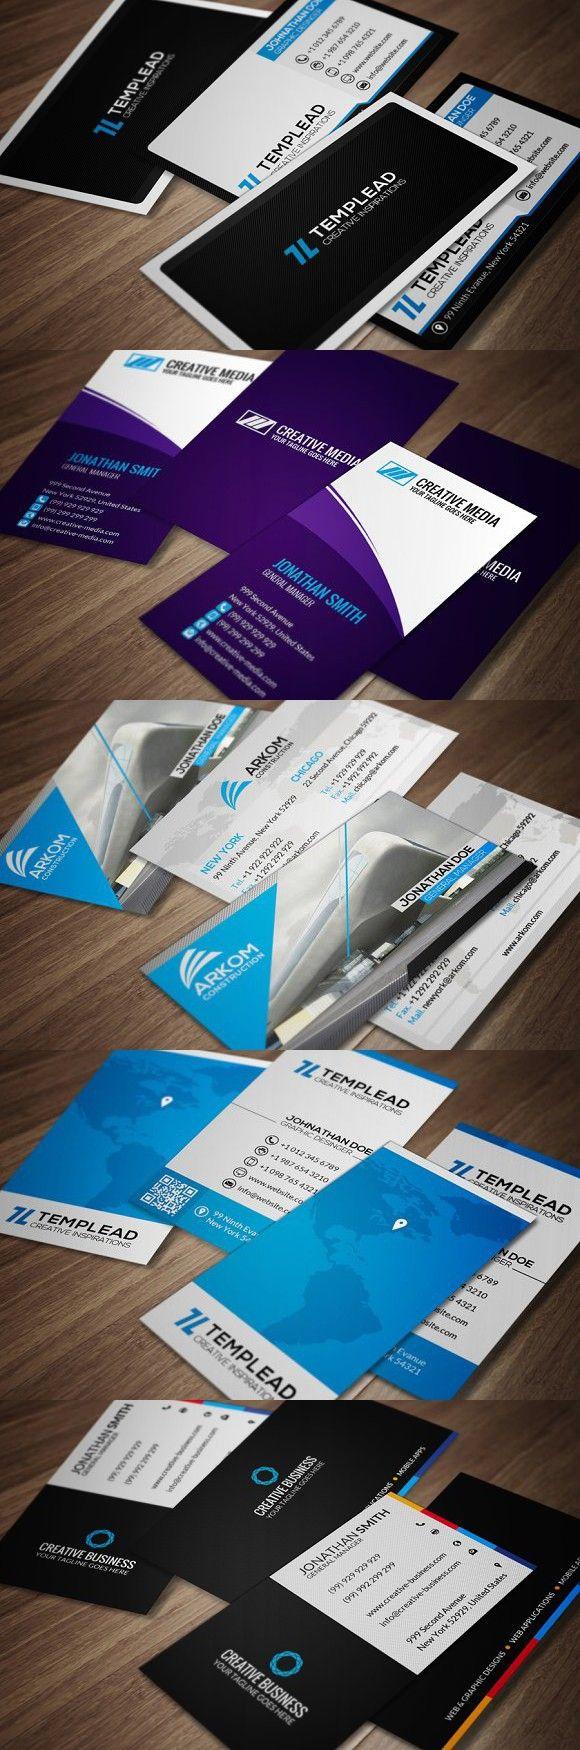 50 business card templates bundle 2 creative business card 50 business card templates bundle 2 creative business card templates creative business card templates pinterest card templates business cards and magicingreecefo Gallery